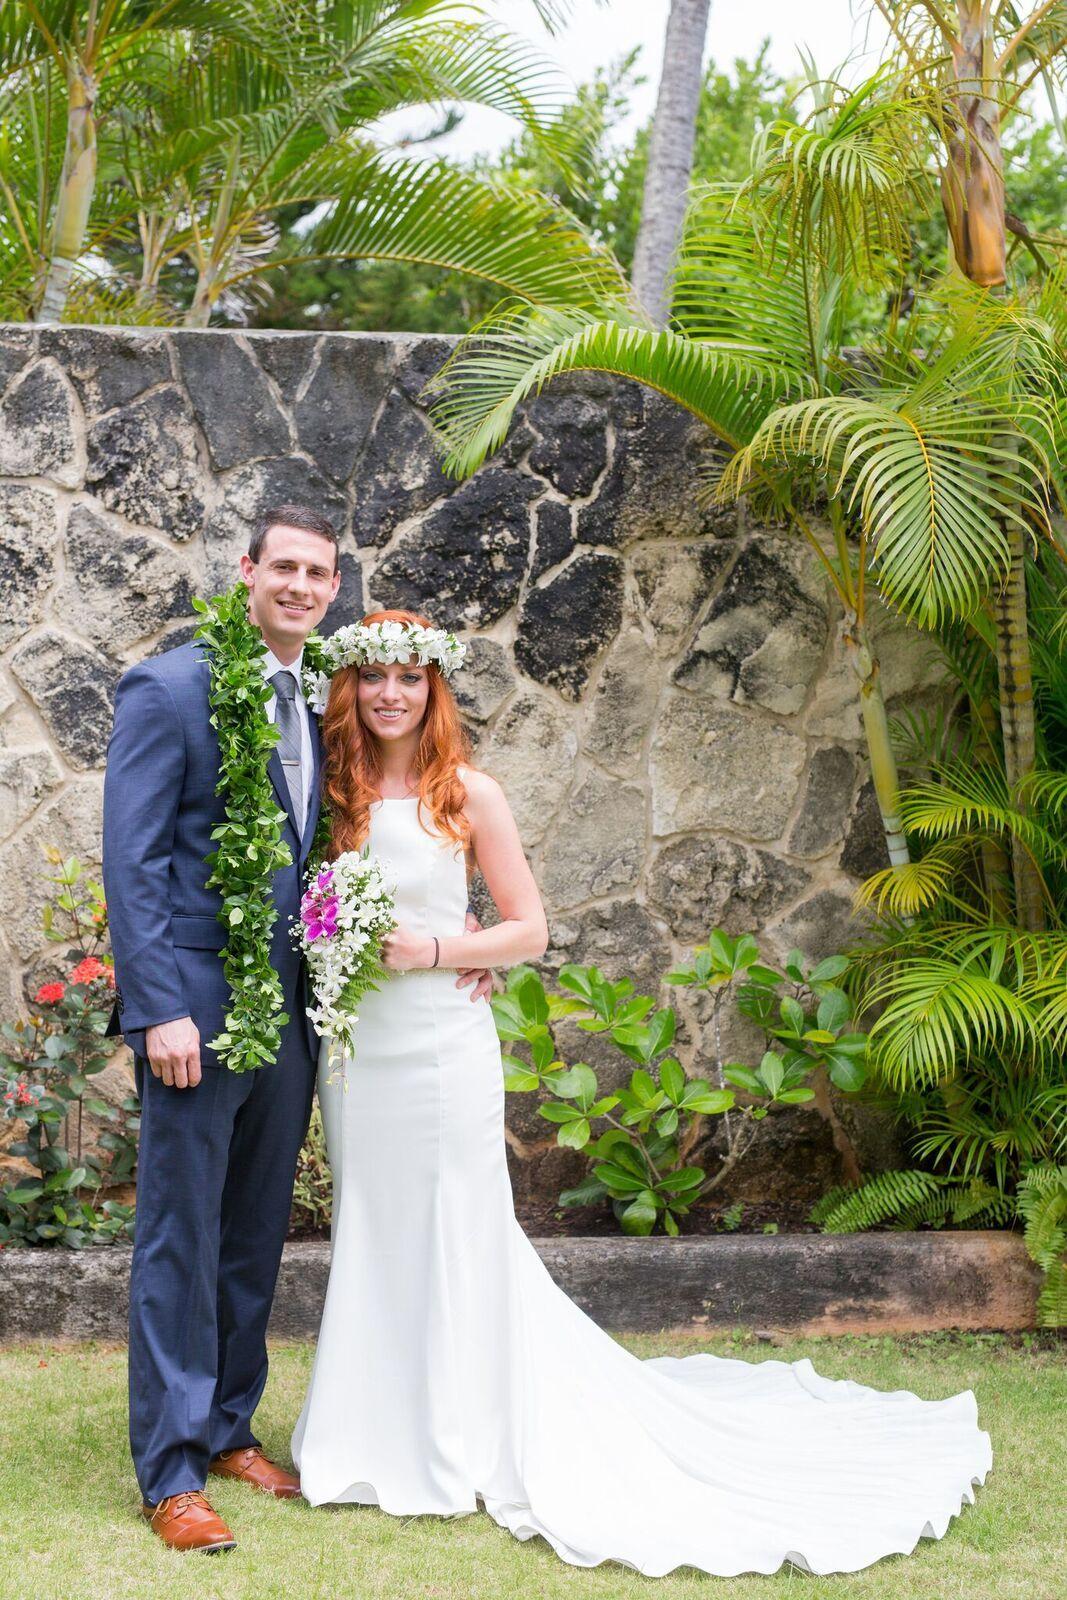 For Your Hawaii Wedding Islander Weddings In Honolulu Hawaii Offers All Inclusive Affordab Hawaii Beach Wedding Beach Wedding Packages Hawaii Wedding Packages